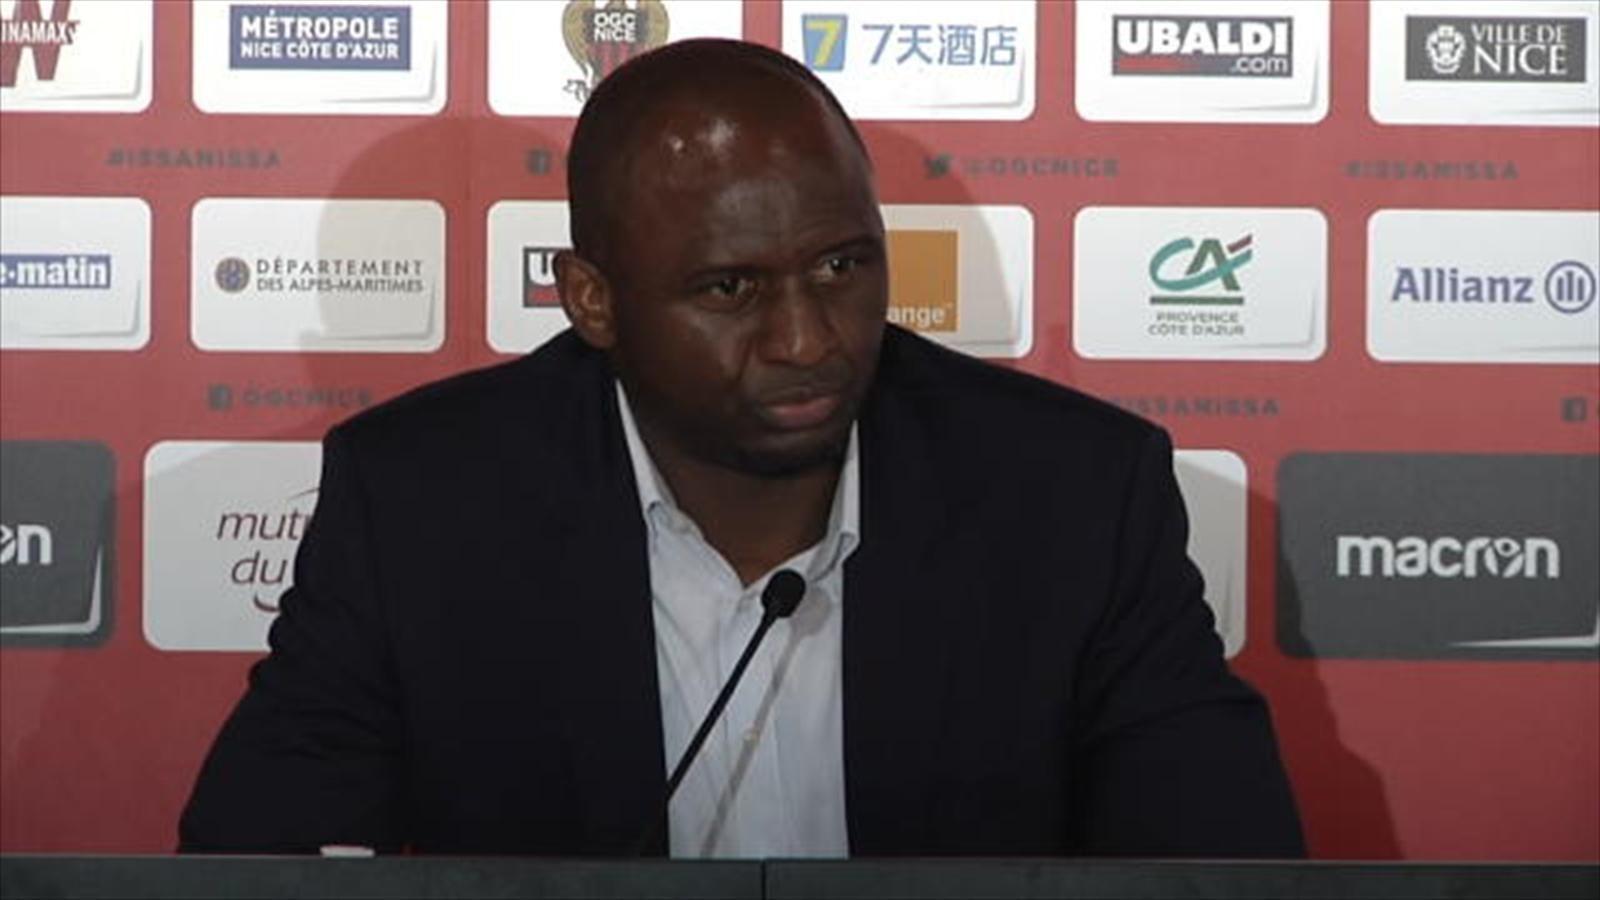 Arsenal actu : Patrick Vieira futur entraîneur des Gunners ?